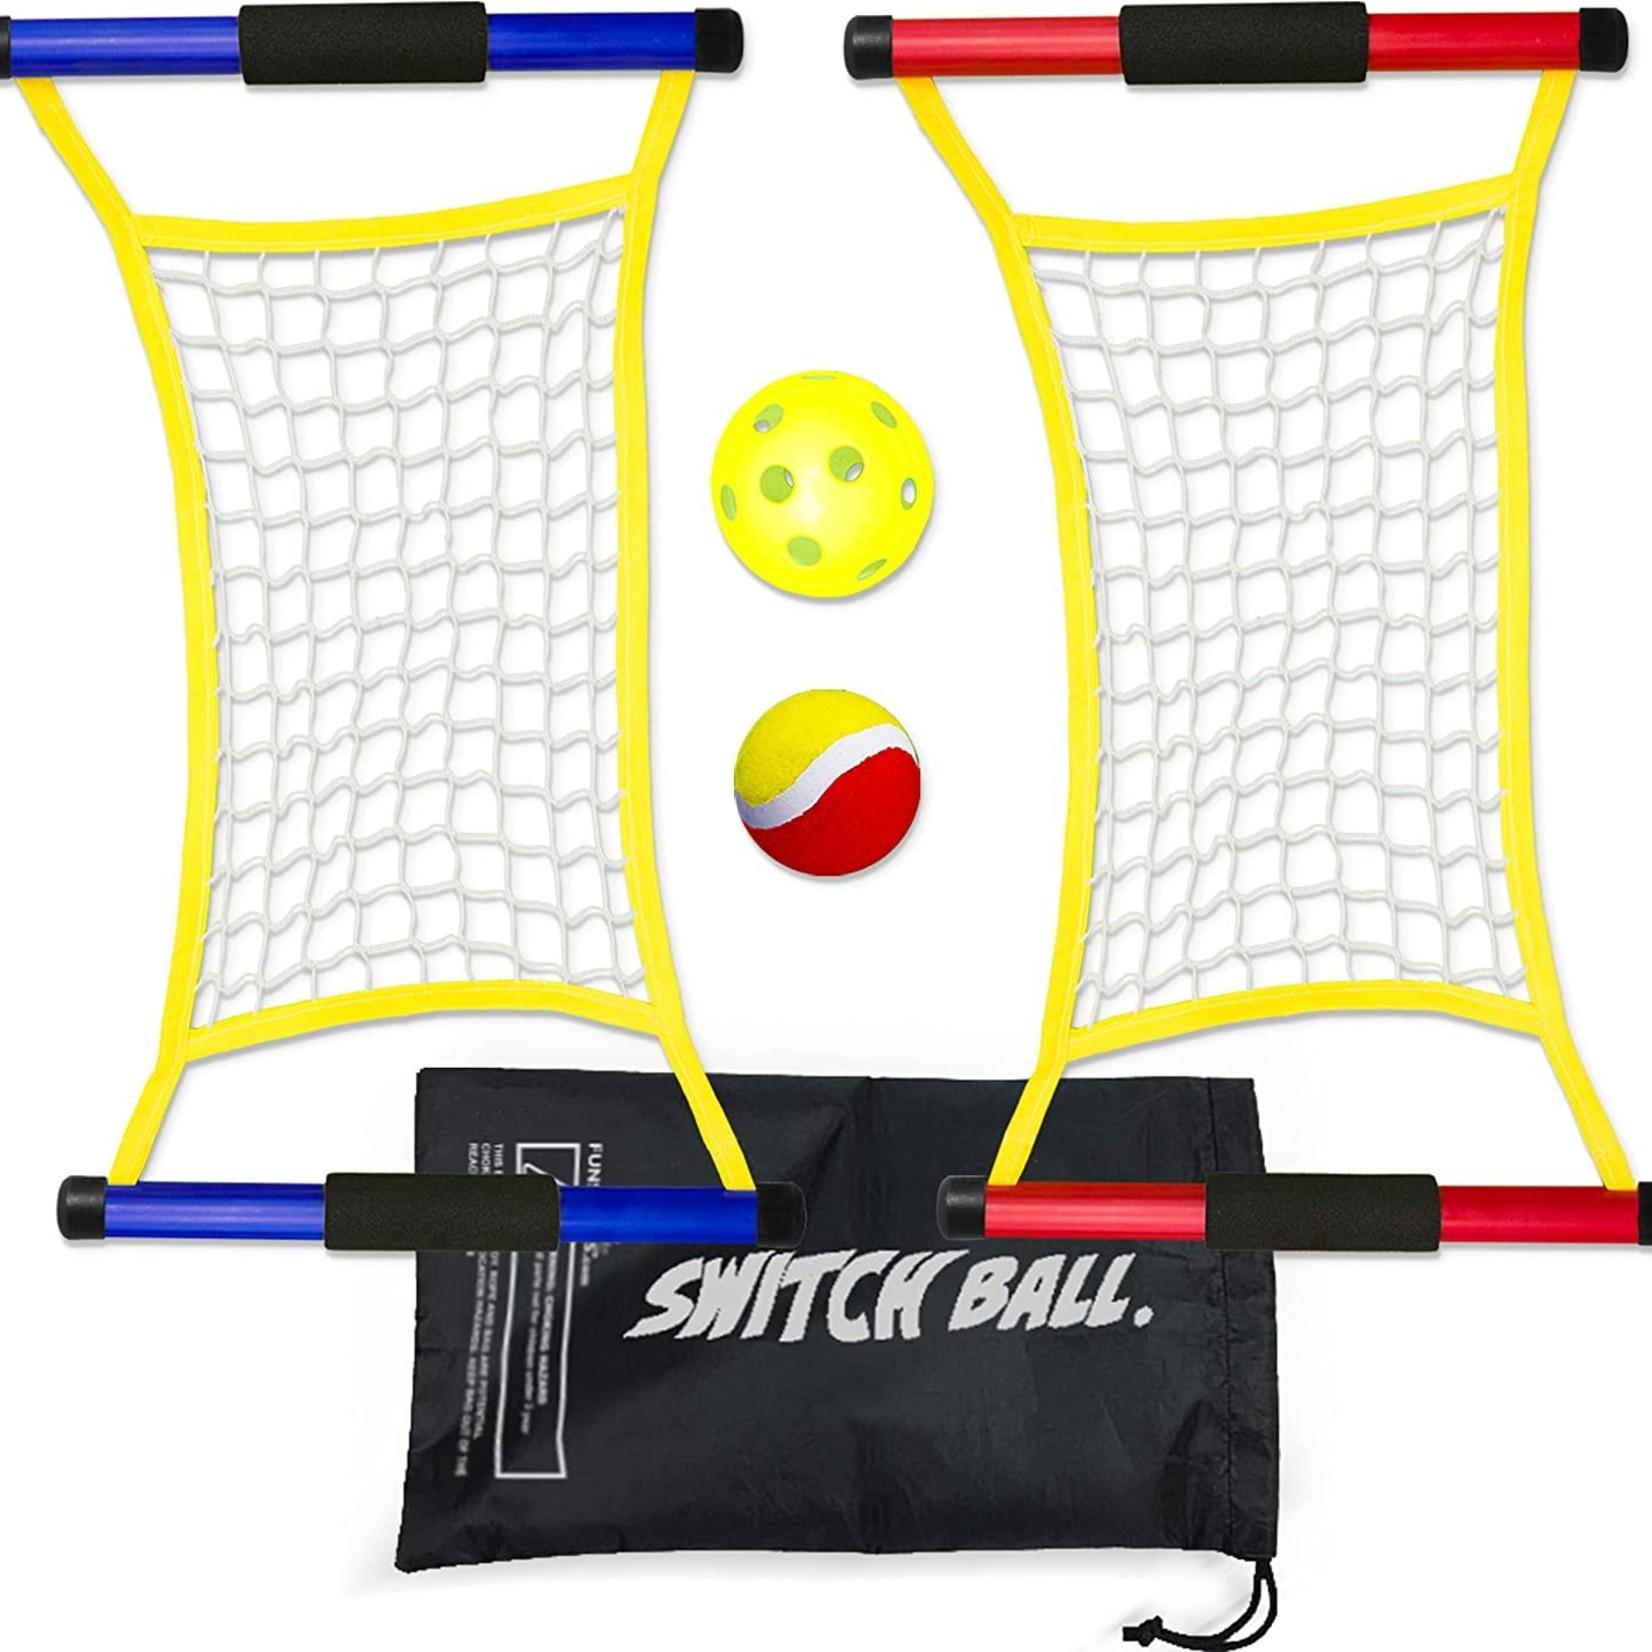 Funsparks Switch Ball